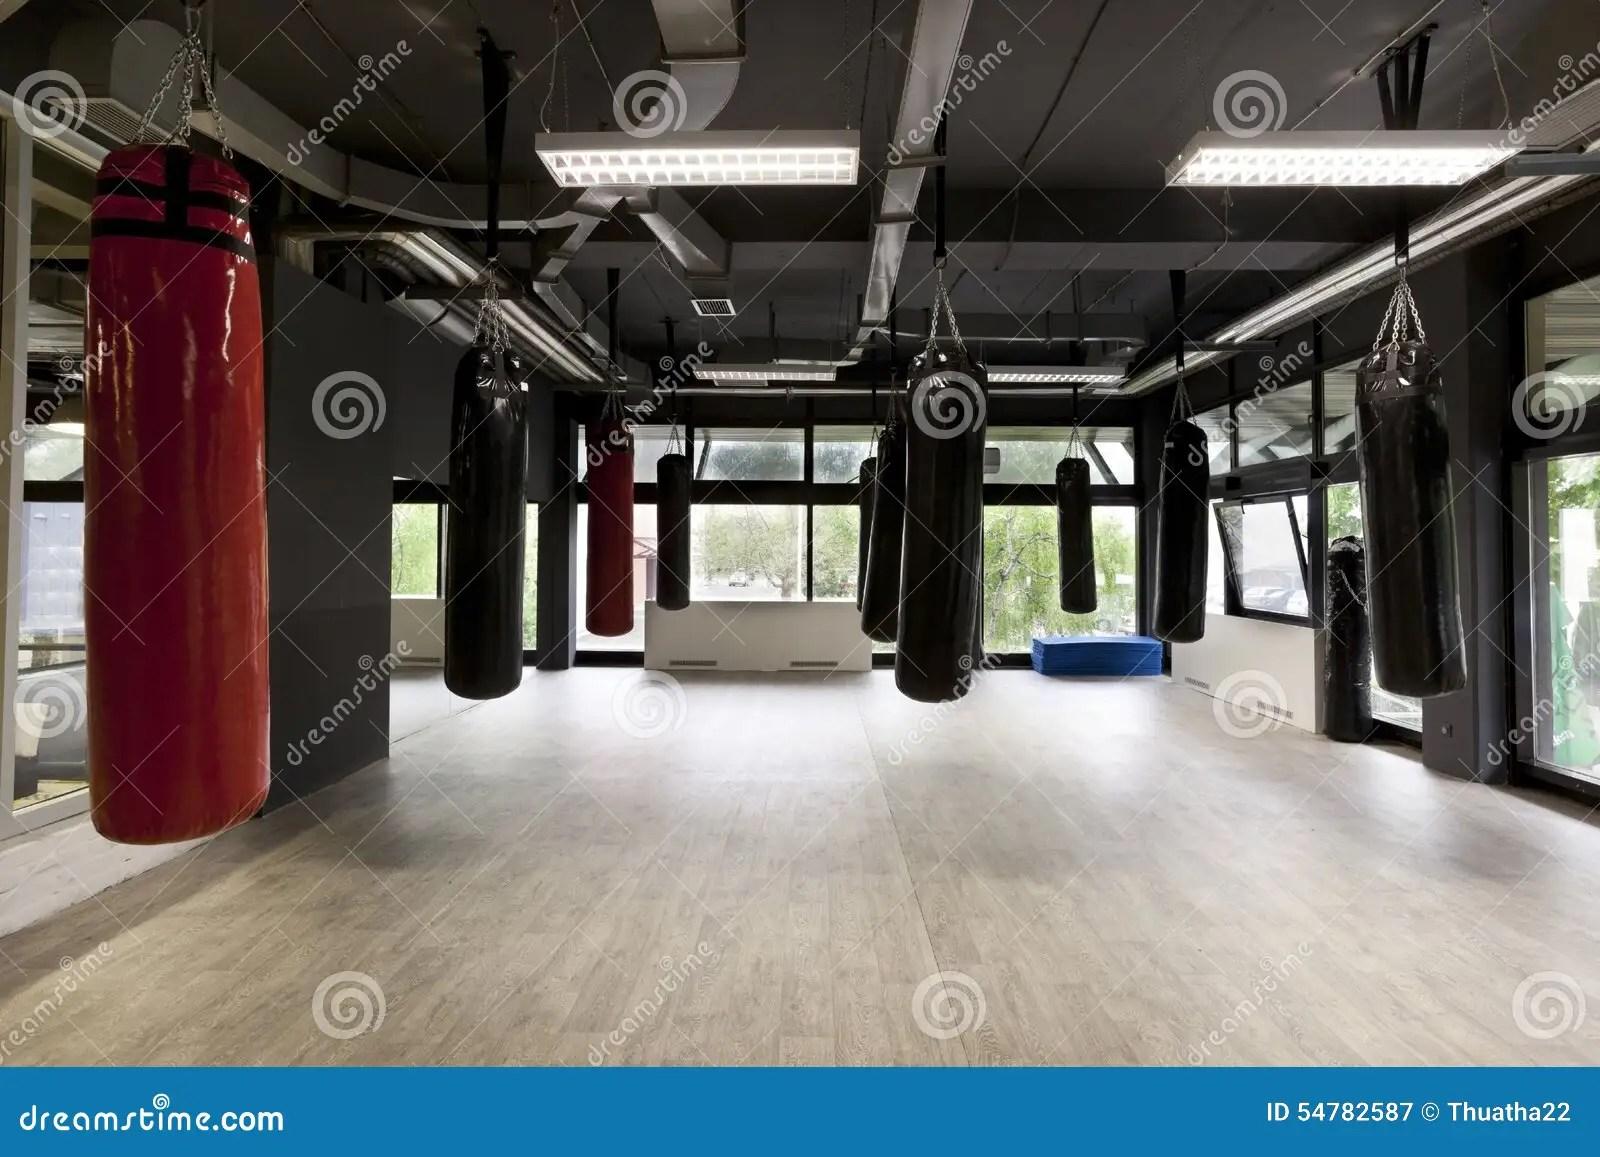 punching bags in modern